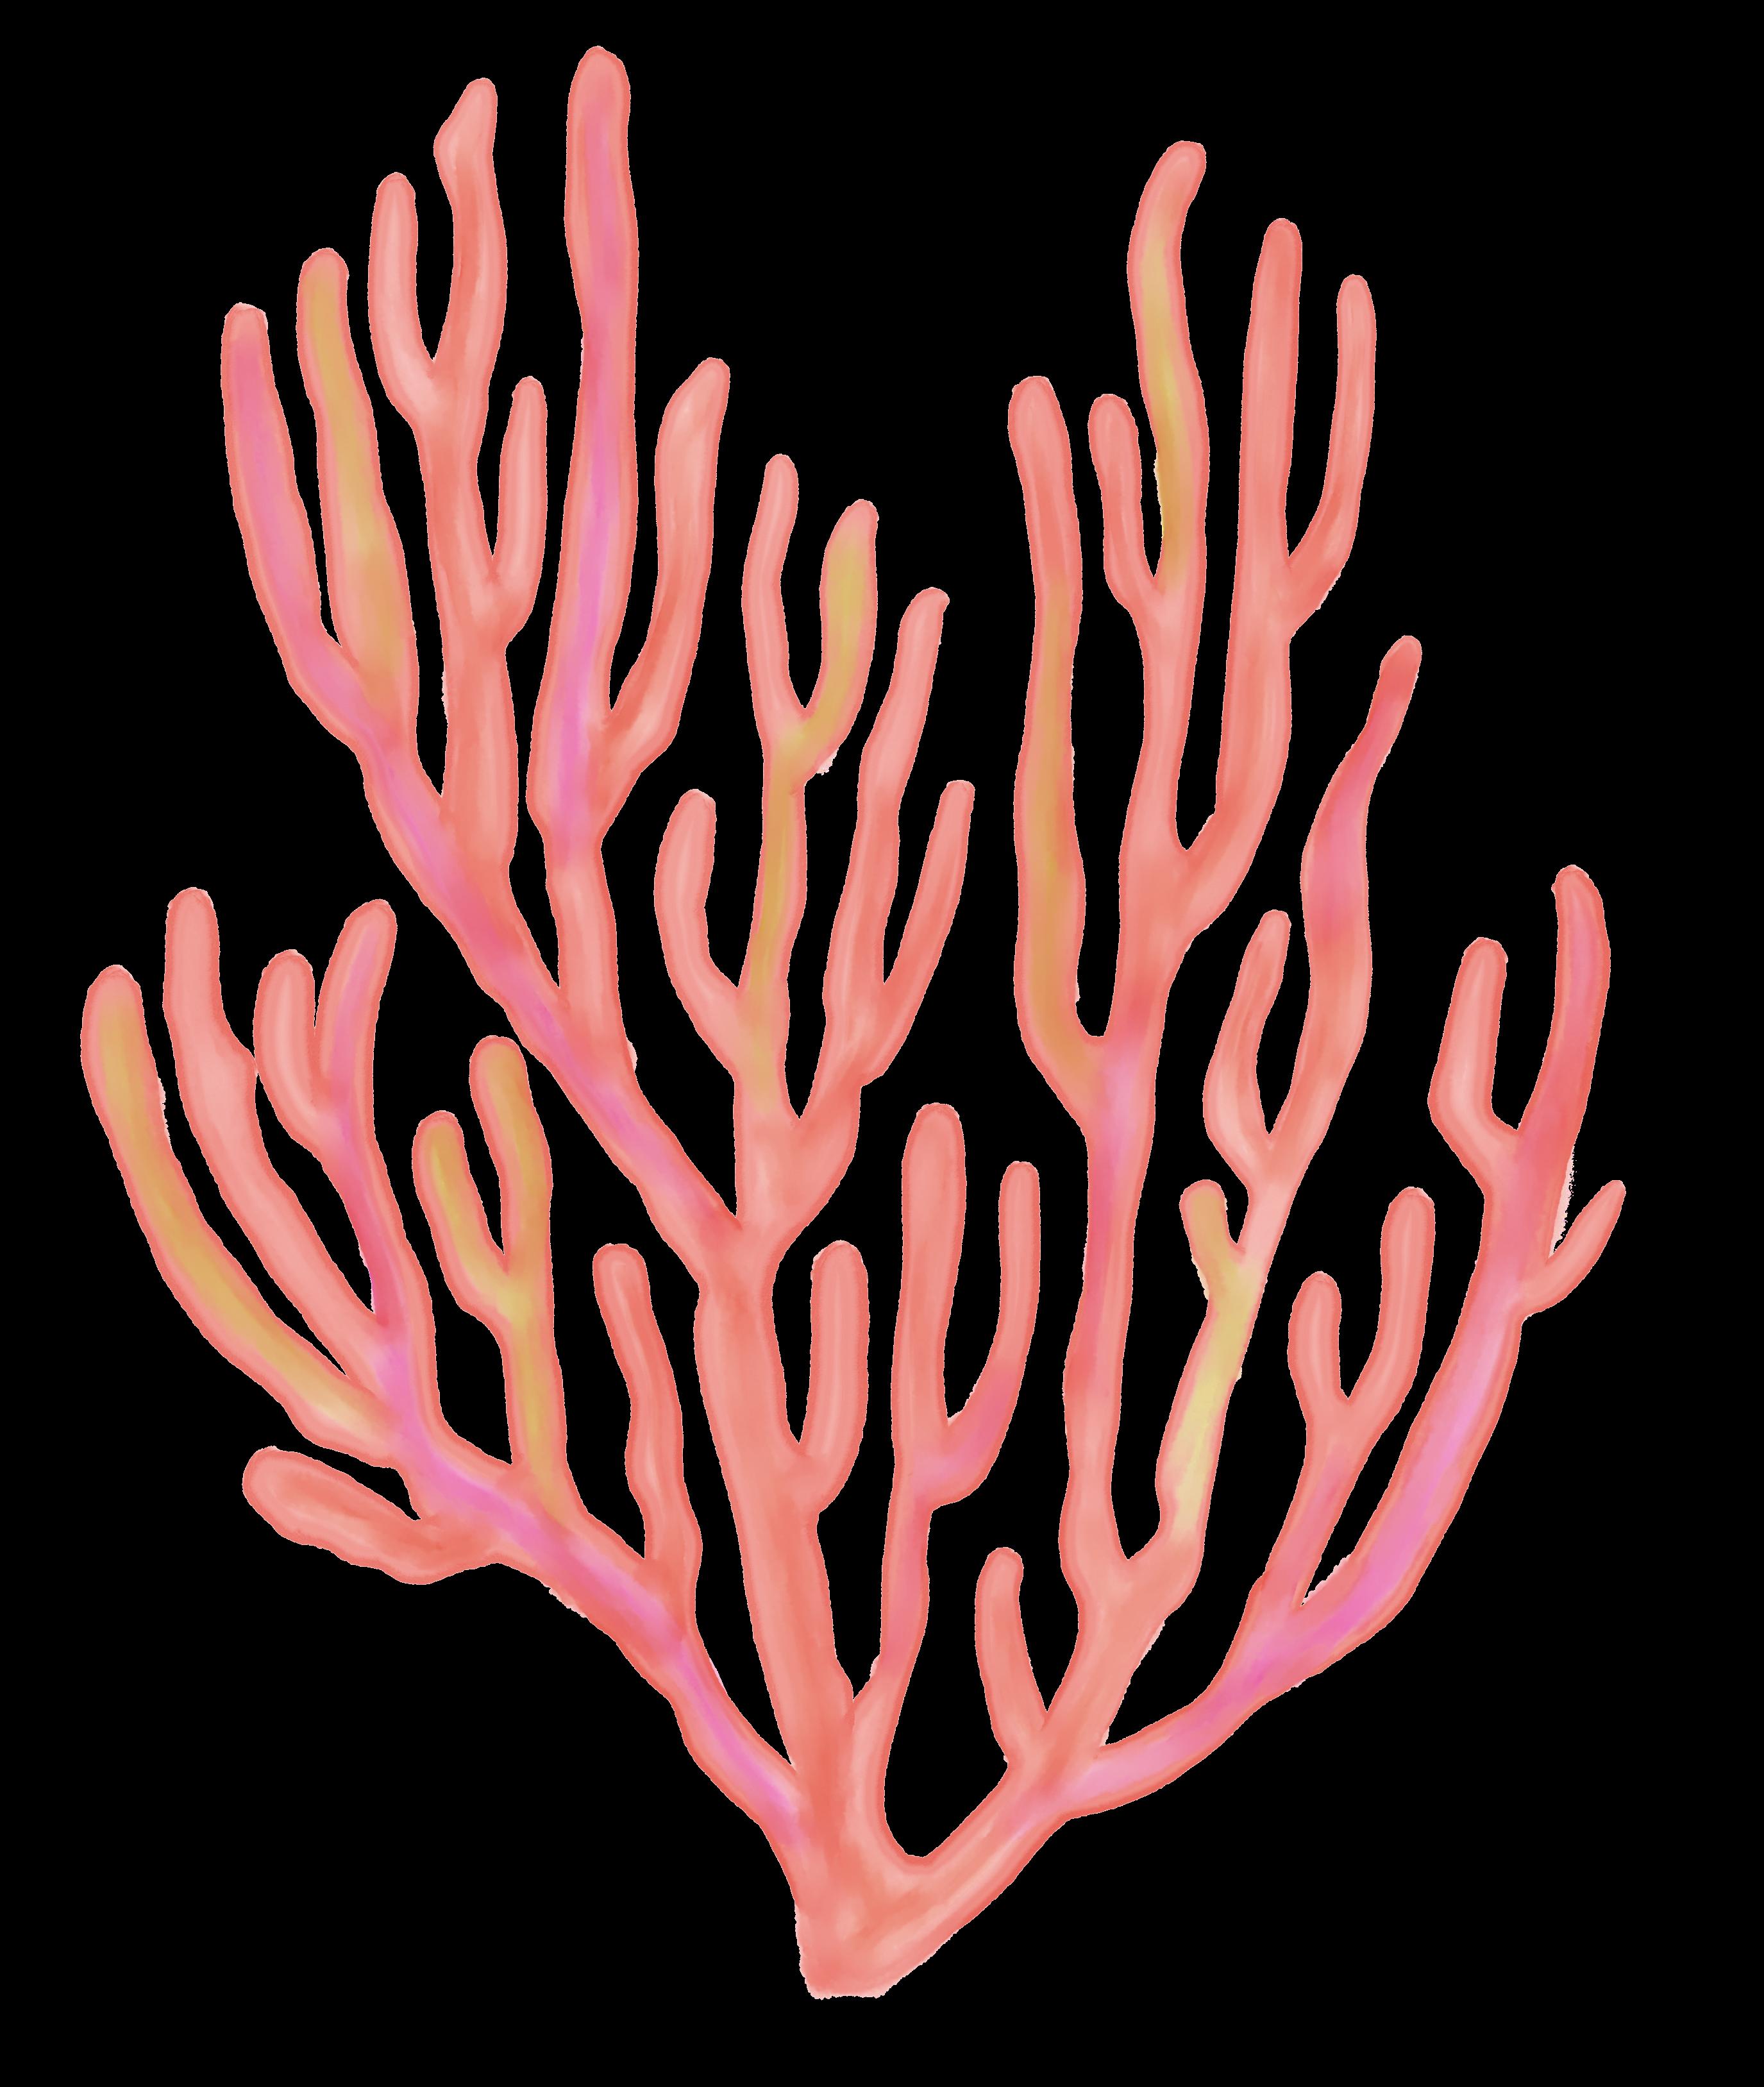 Pin by Tamara Nesic on art prints Fan coral, Coral